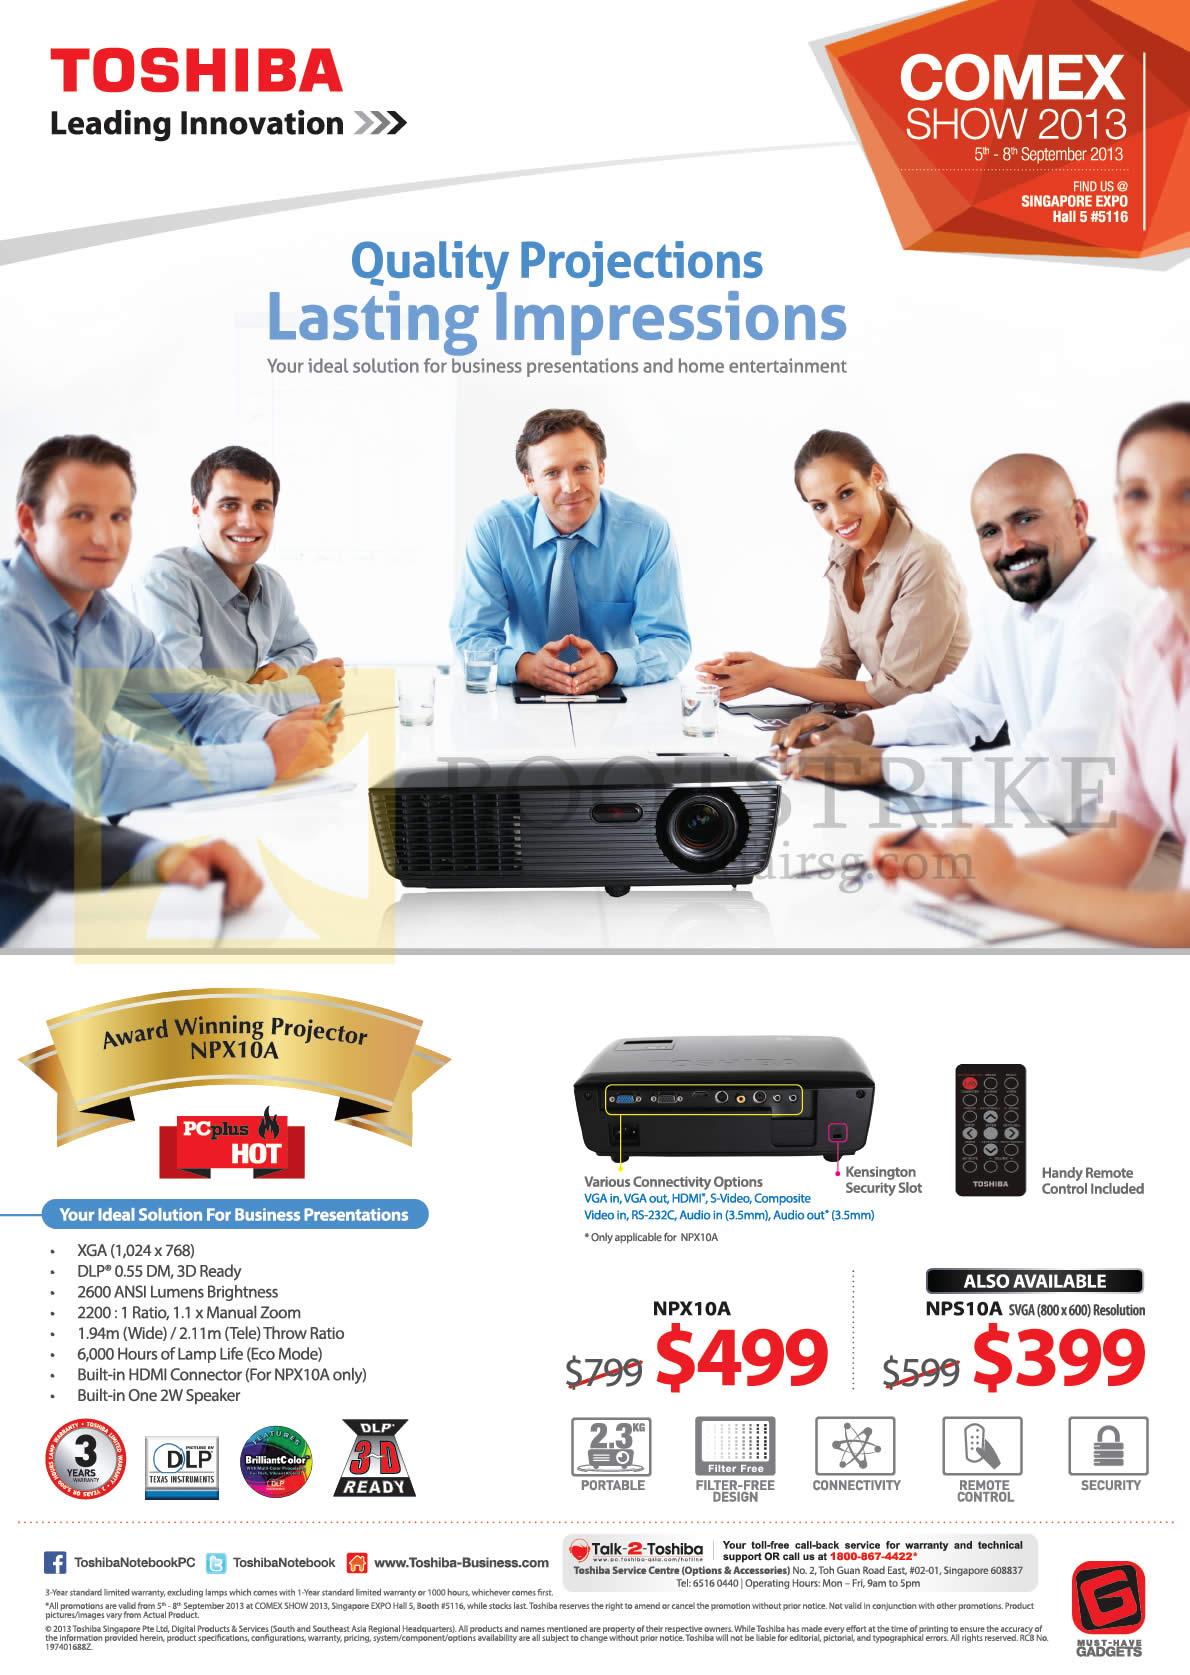 COMEX 2013 price list image brochure of Toshiba Projectors NPX10A, NPS10A